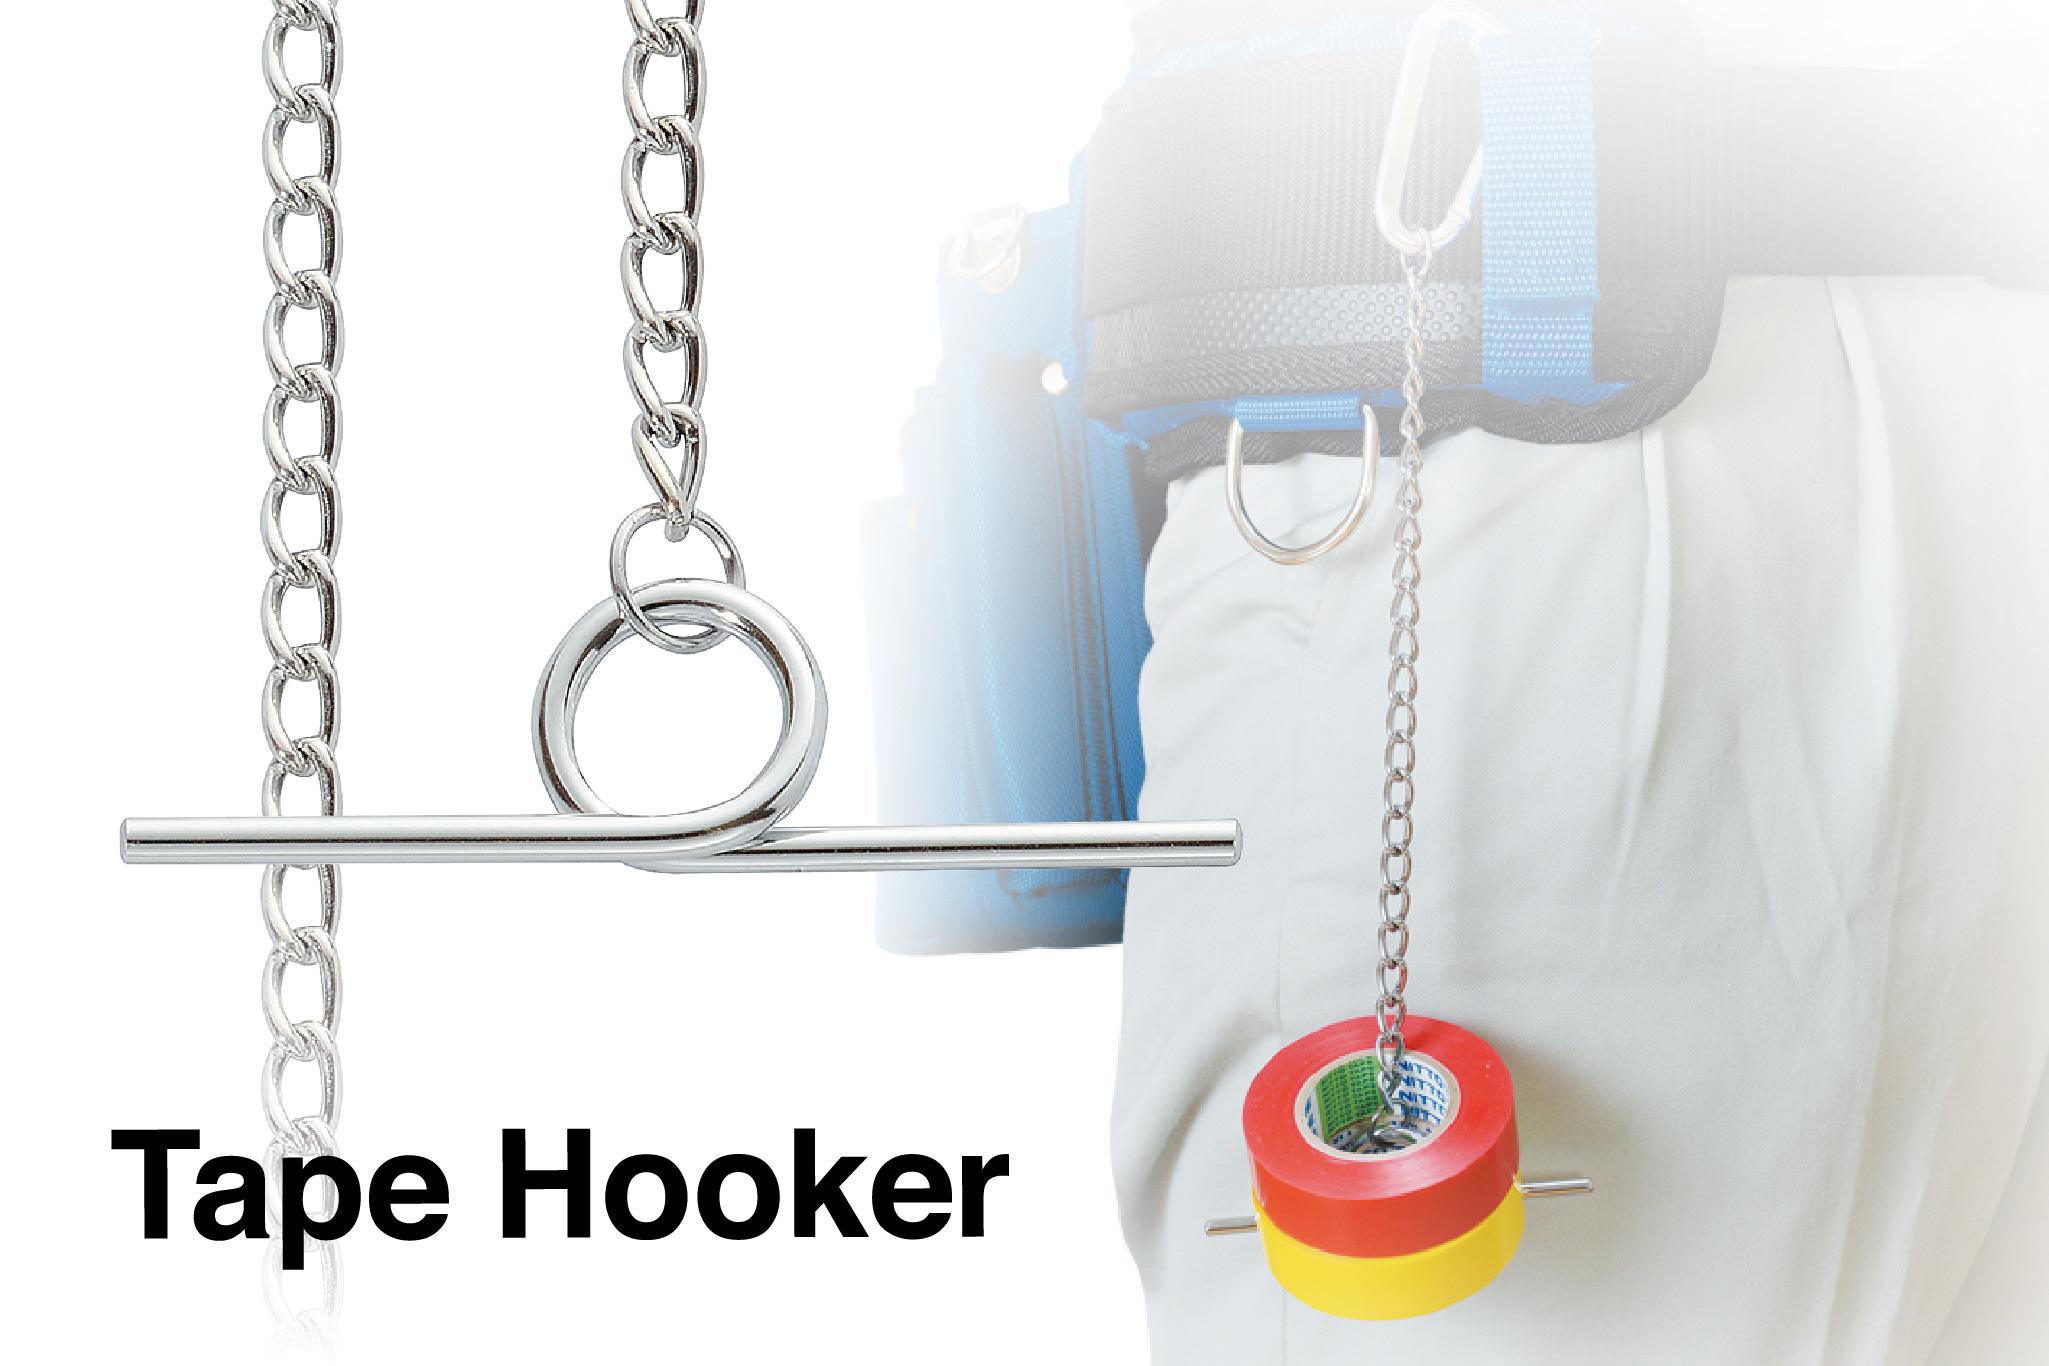 Tape Hooker